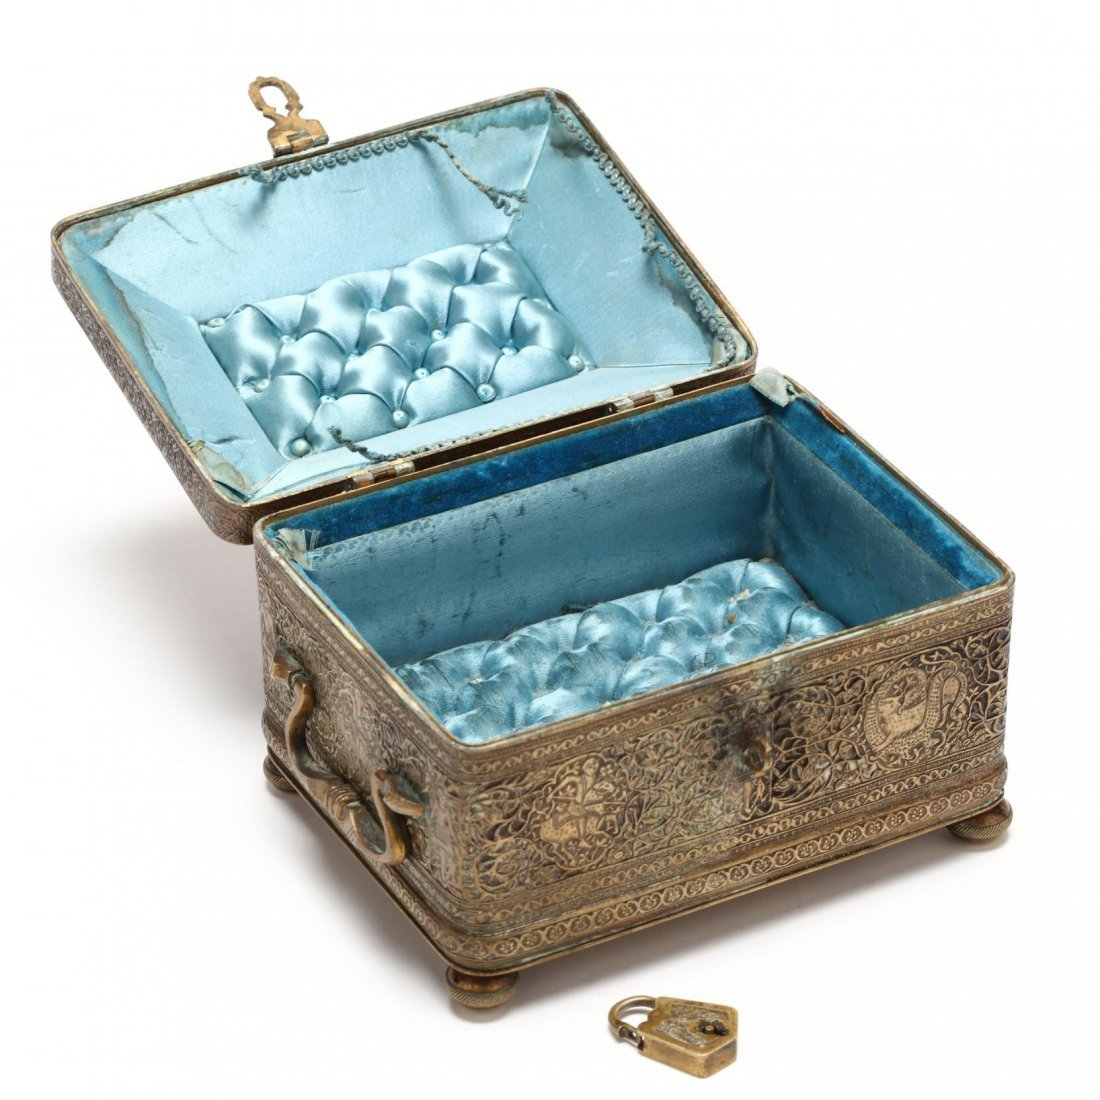 Persian Qajar Copper Jewelry Box c.19th cent AD. - 3